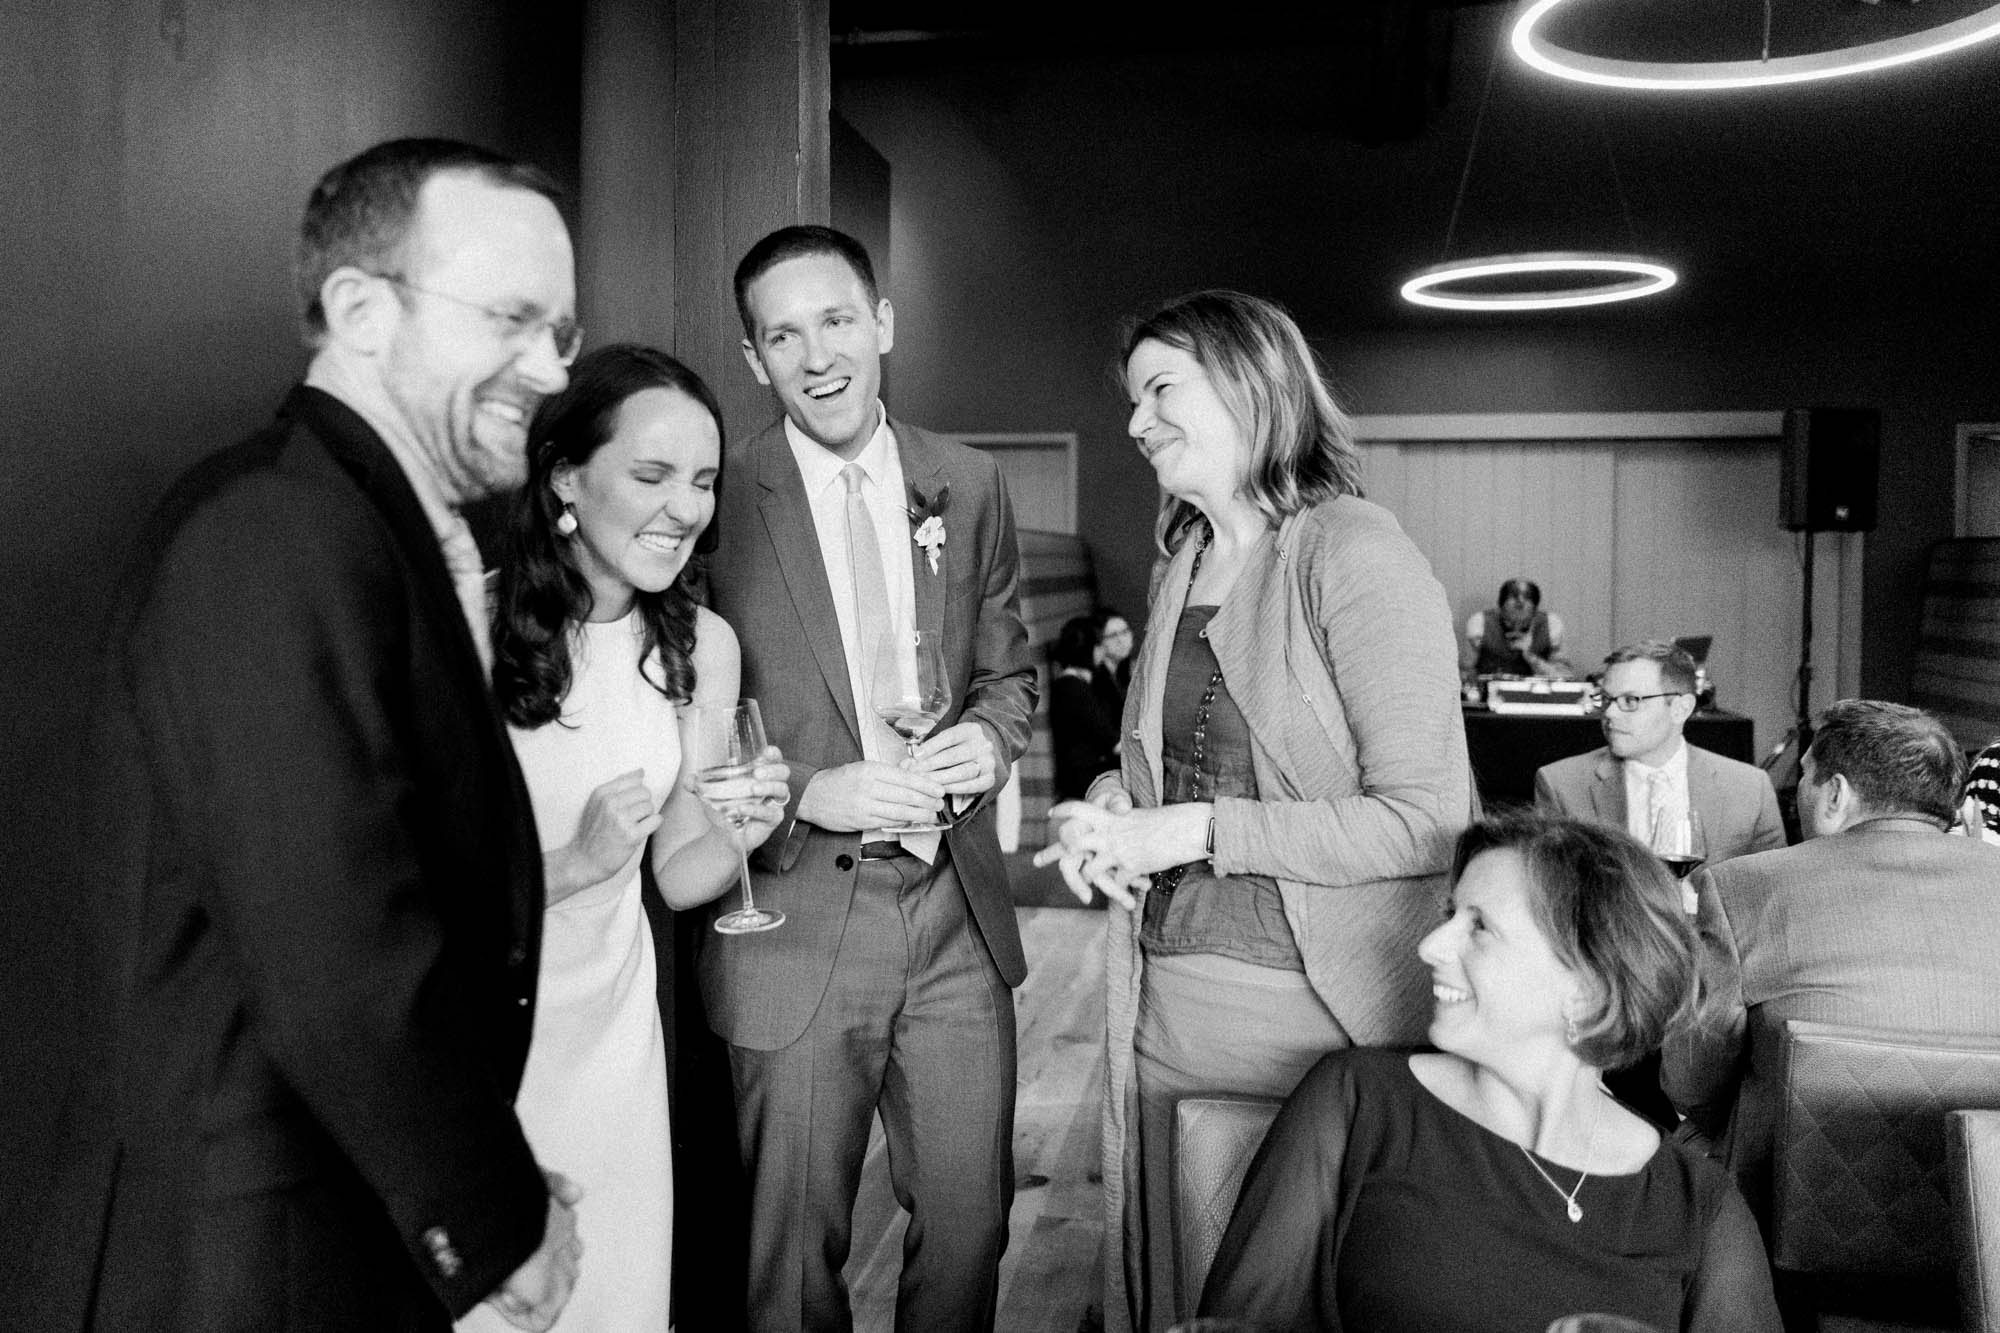 Vina+Enoteca+Palo+Alto+Wedding+060.jpg